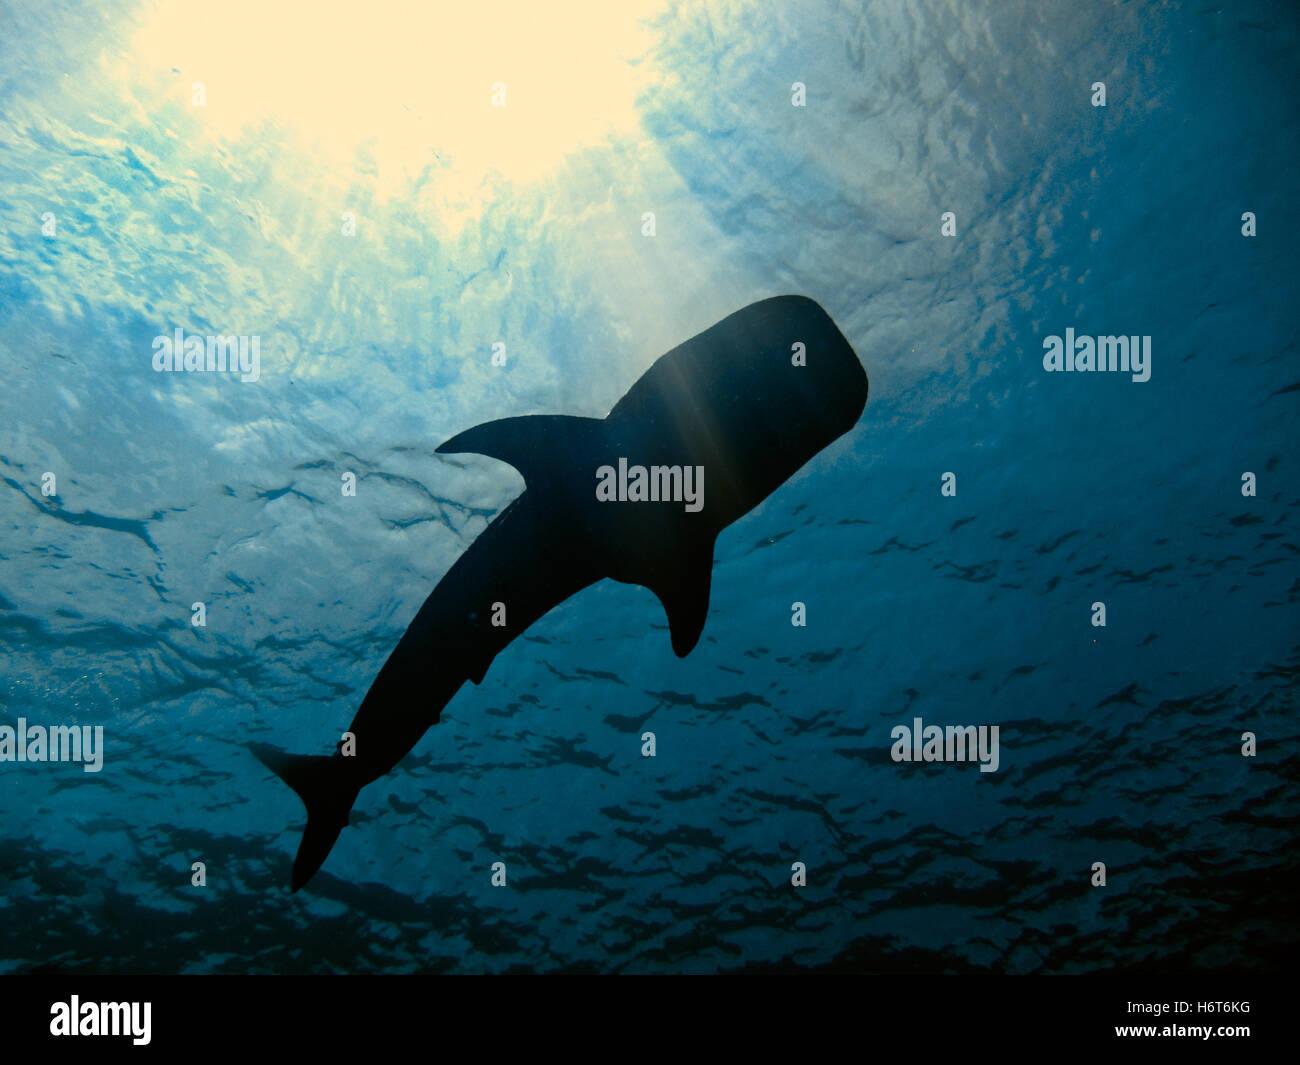 blue, shine, shines, bright, lucent, light, serene, luminous, life, exist, - Stock Image